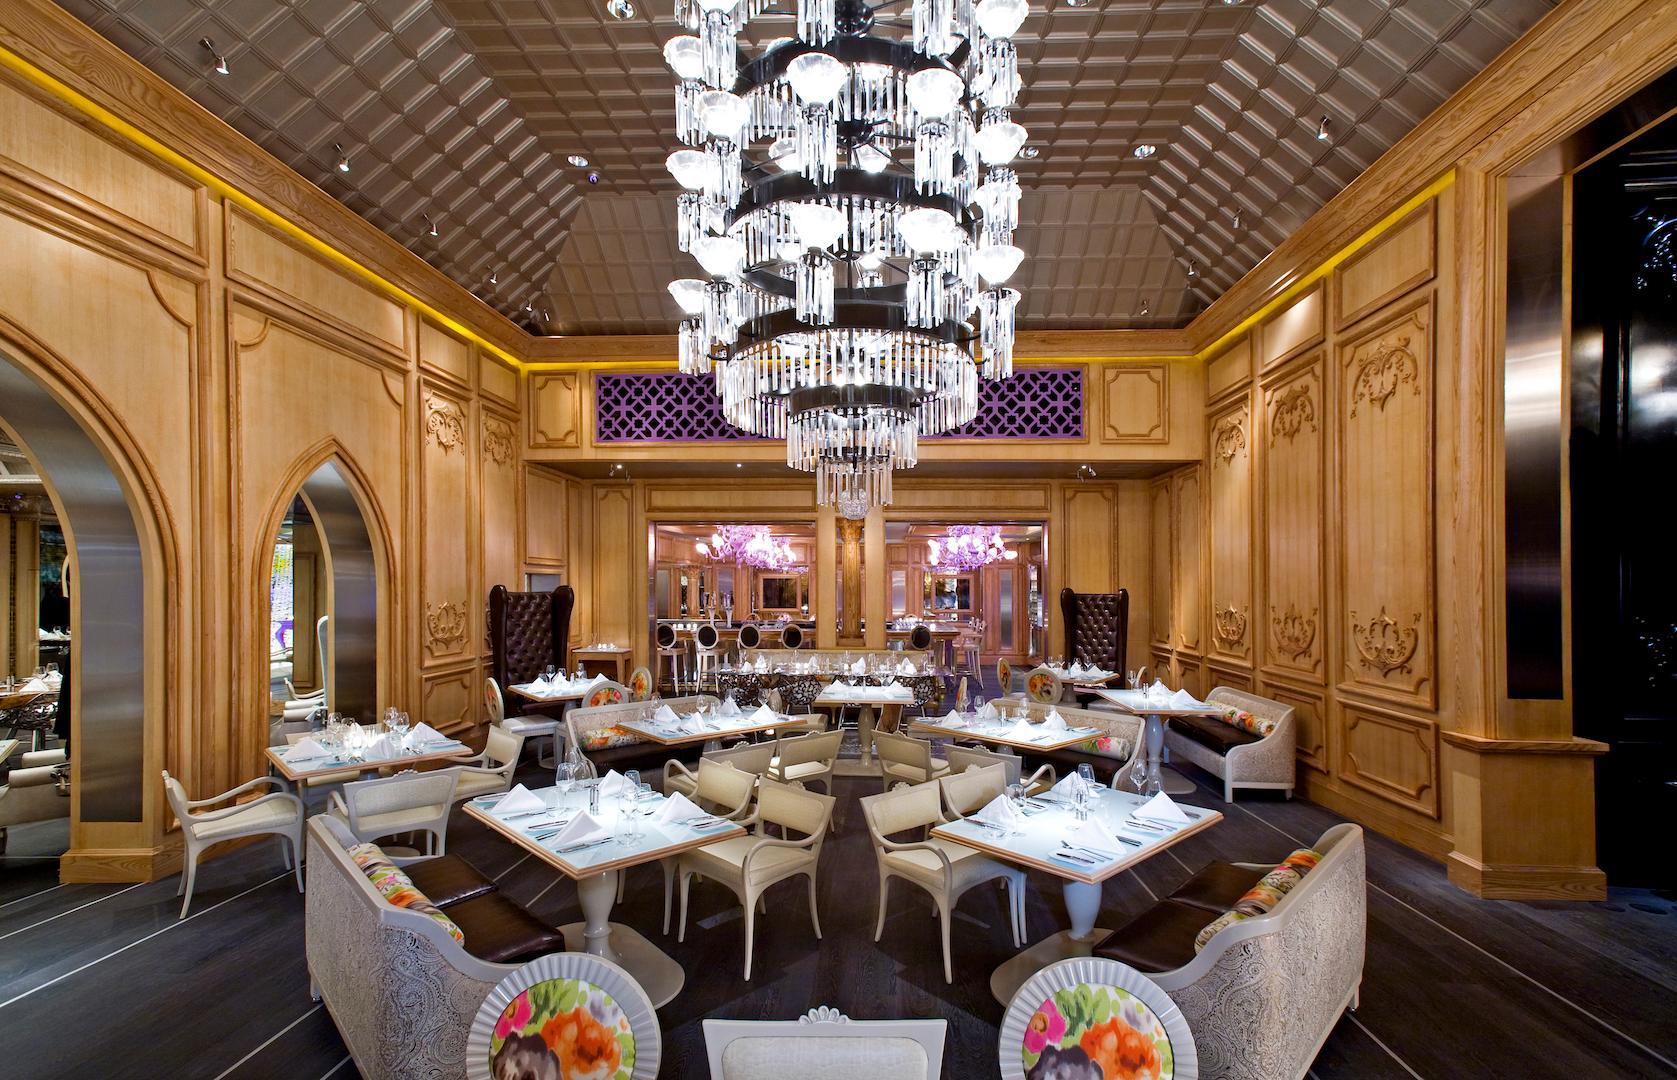 The Forge Restaurant & Steakhouse